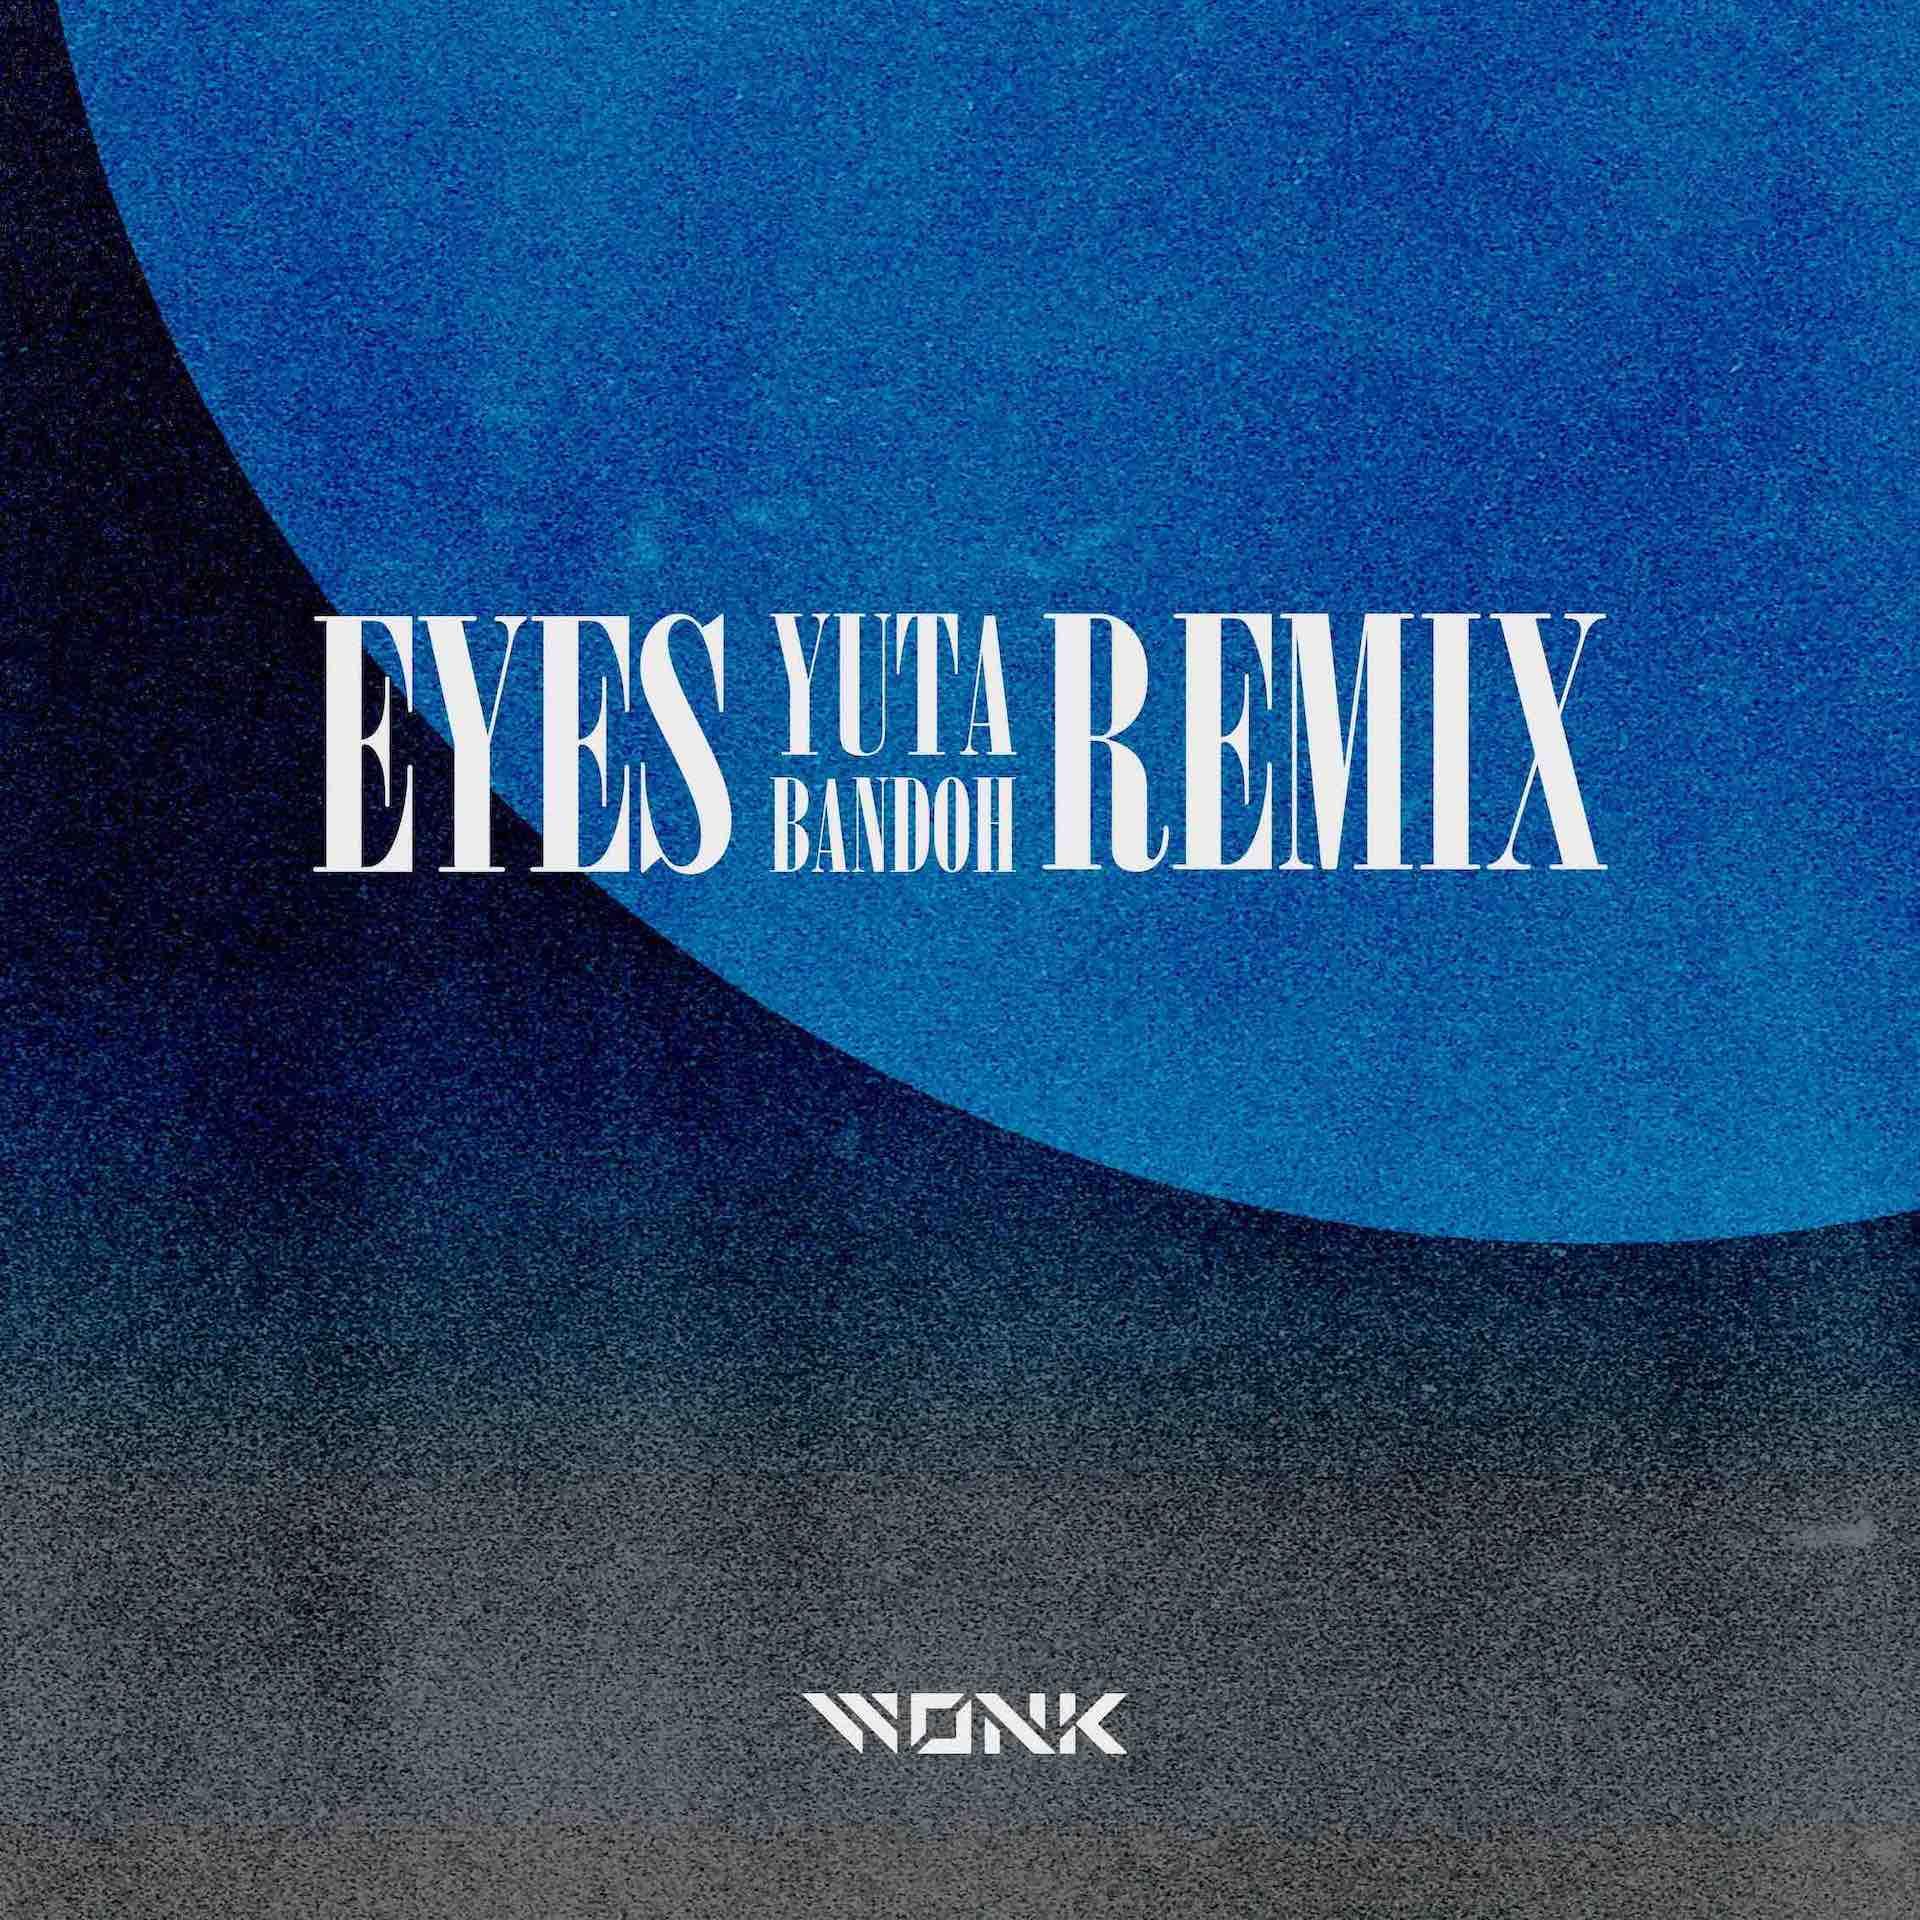 WONK『EYES』のリミックスシリーズが配信決定!坂東祐大、Oscar Jerome、Charlie Limが参加 music210609_wonk_remix_5